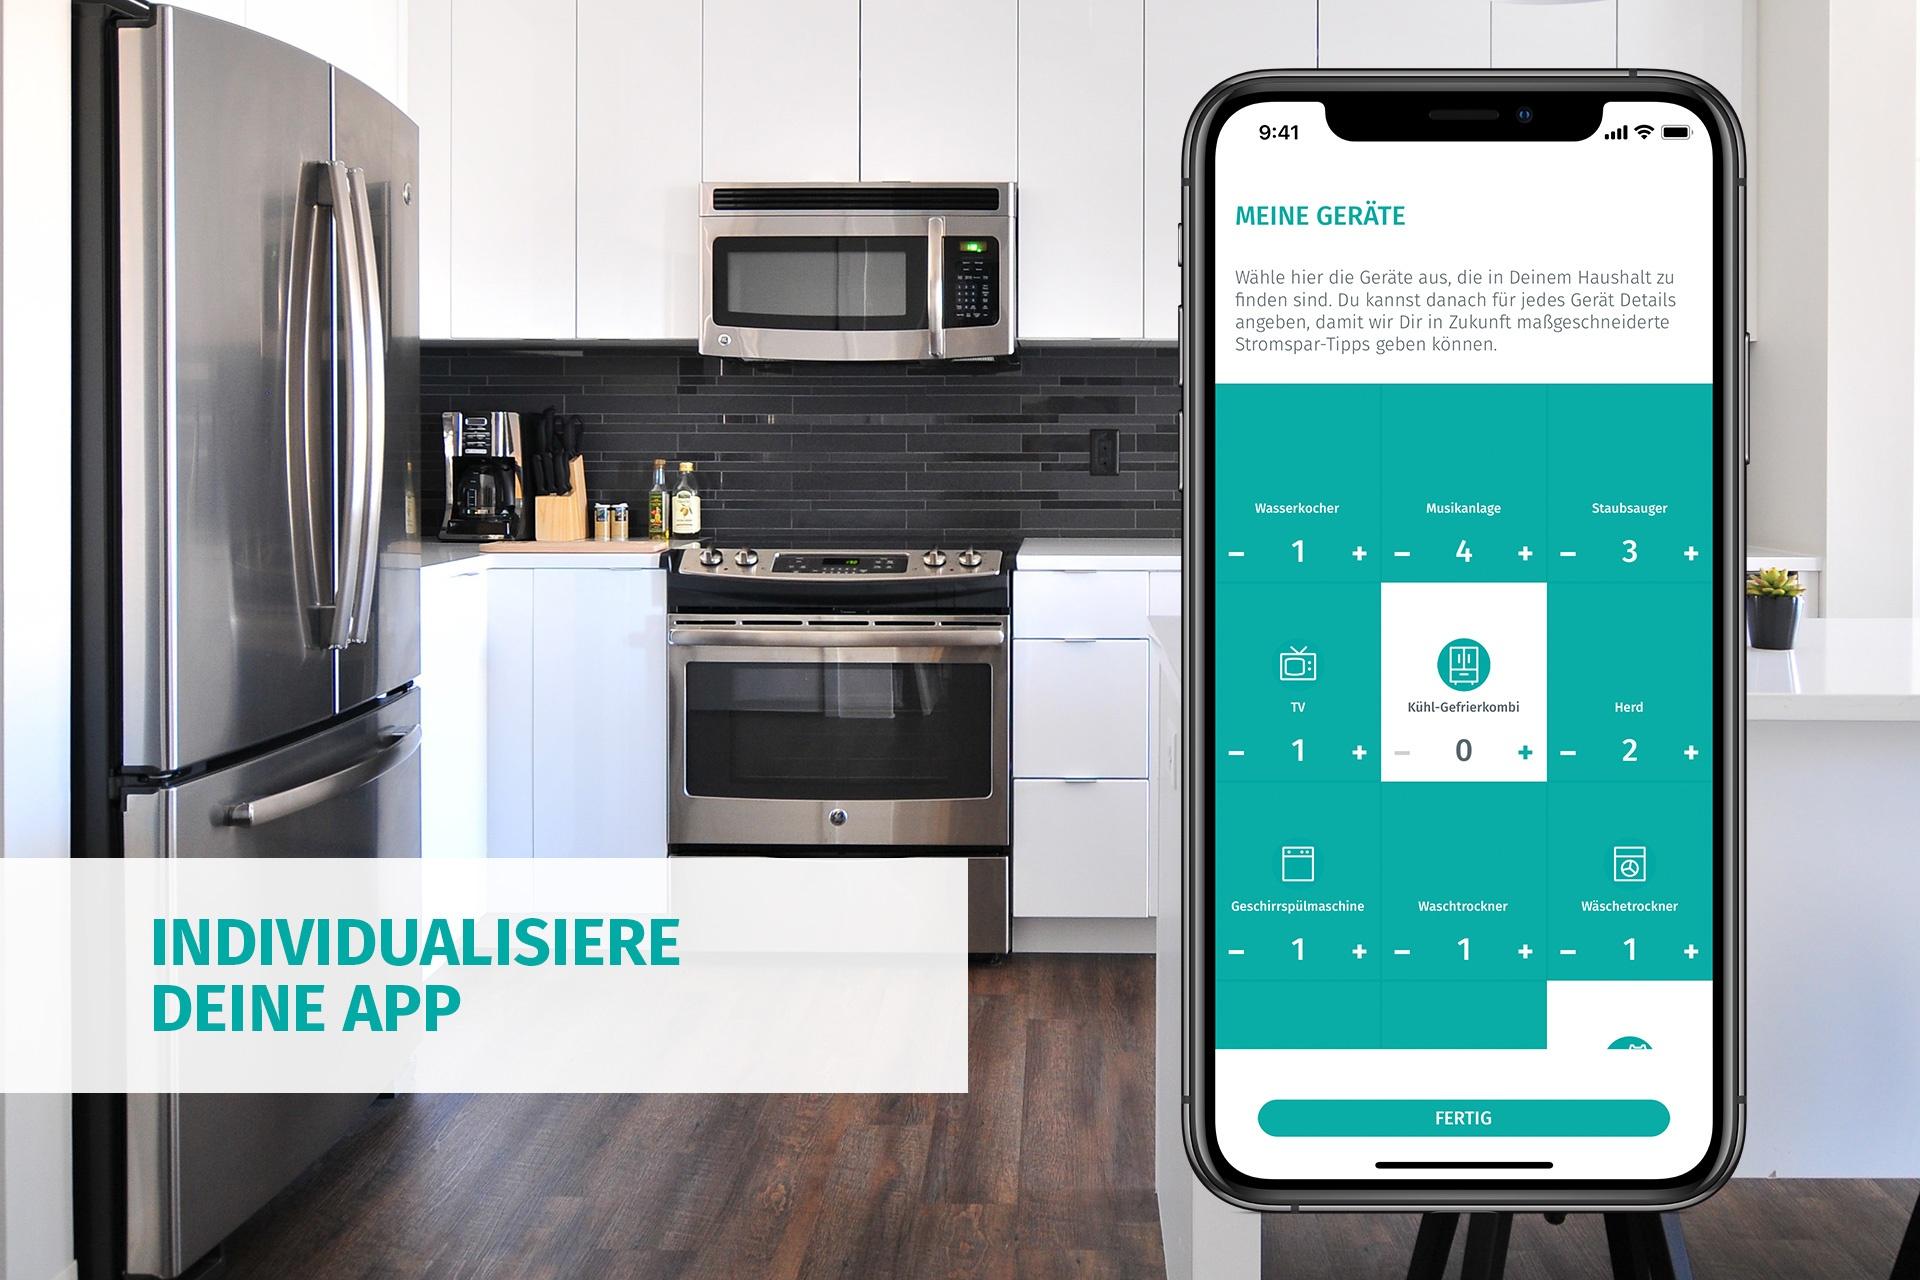 Individualisiere deine enera App